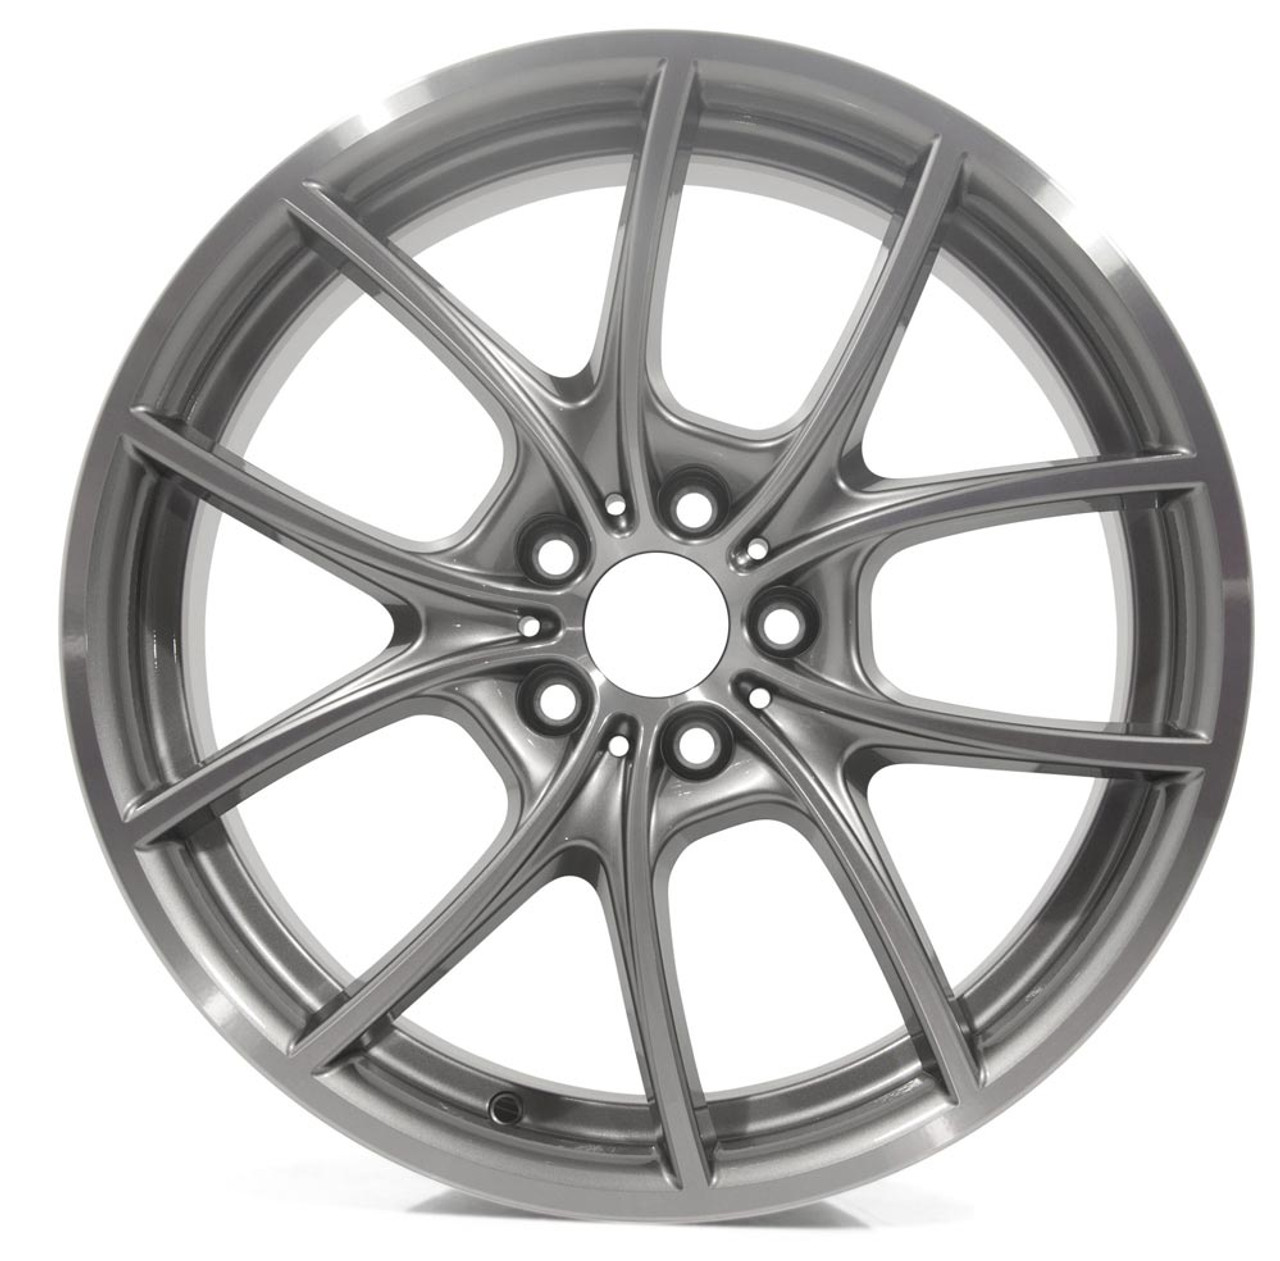 BMW  20x8.5 Front Wheel, V-Spoke 356, Bicolor